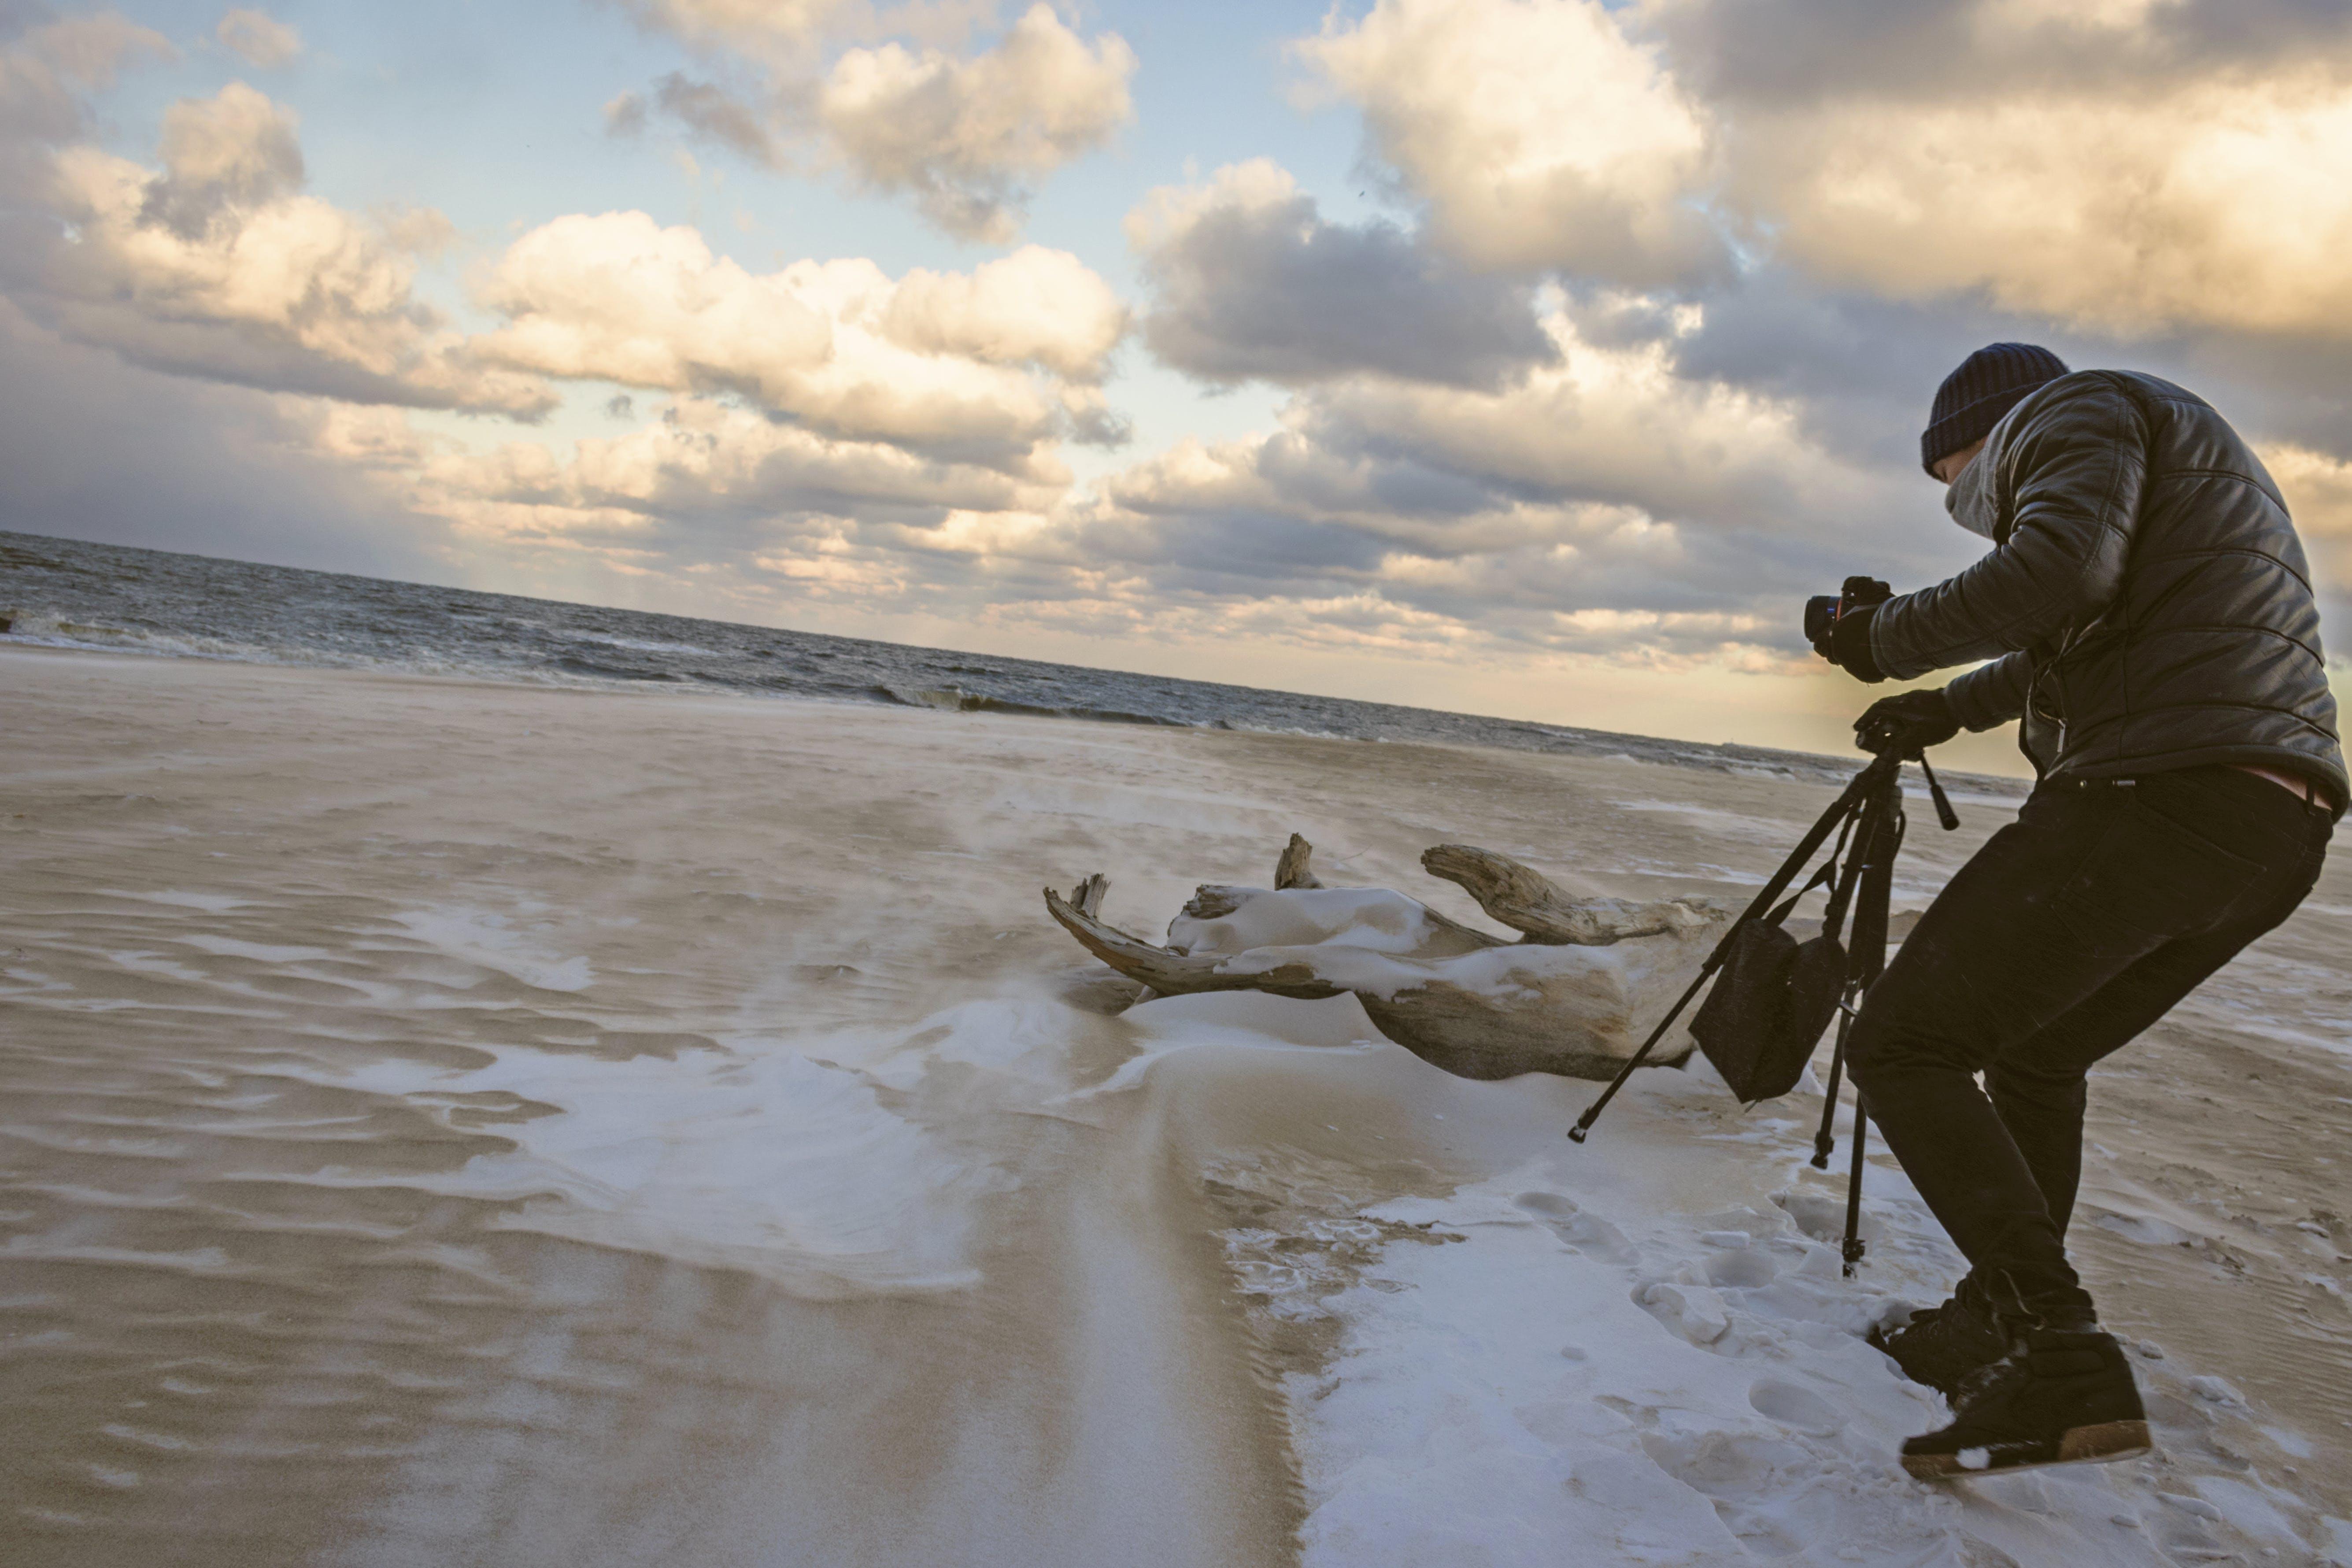 Man in Black Bubble Jacket Walking on Seashore While Holding Black Camera Tripod